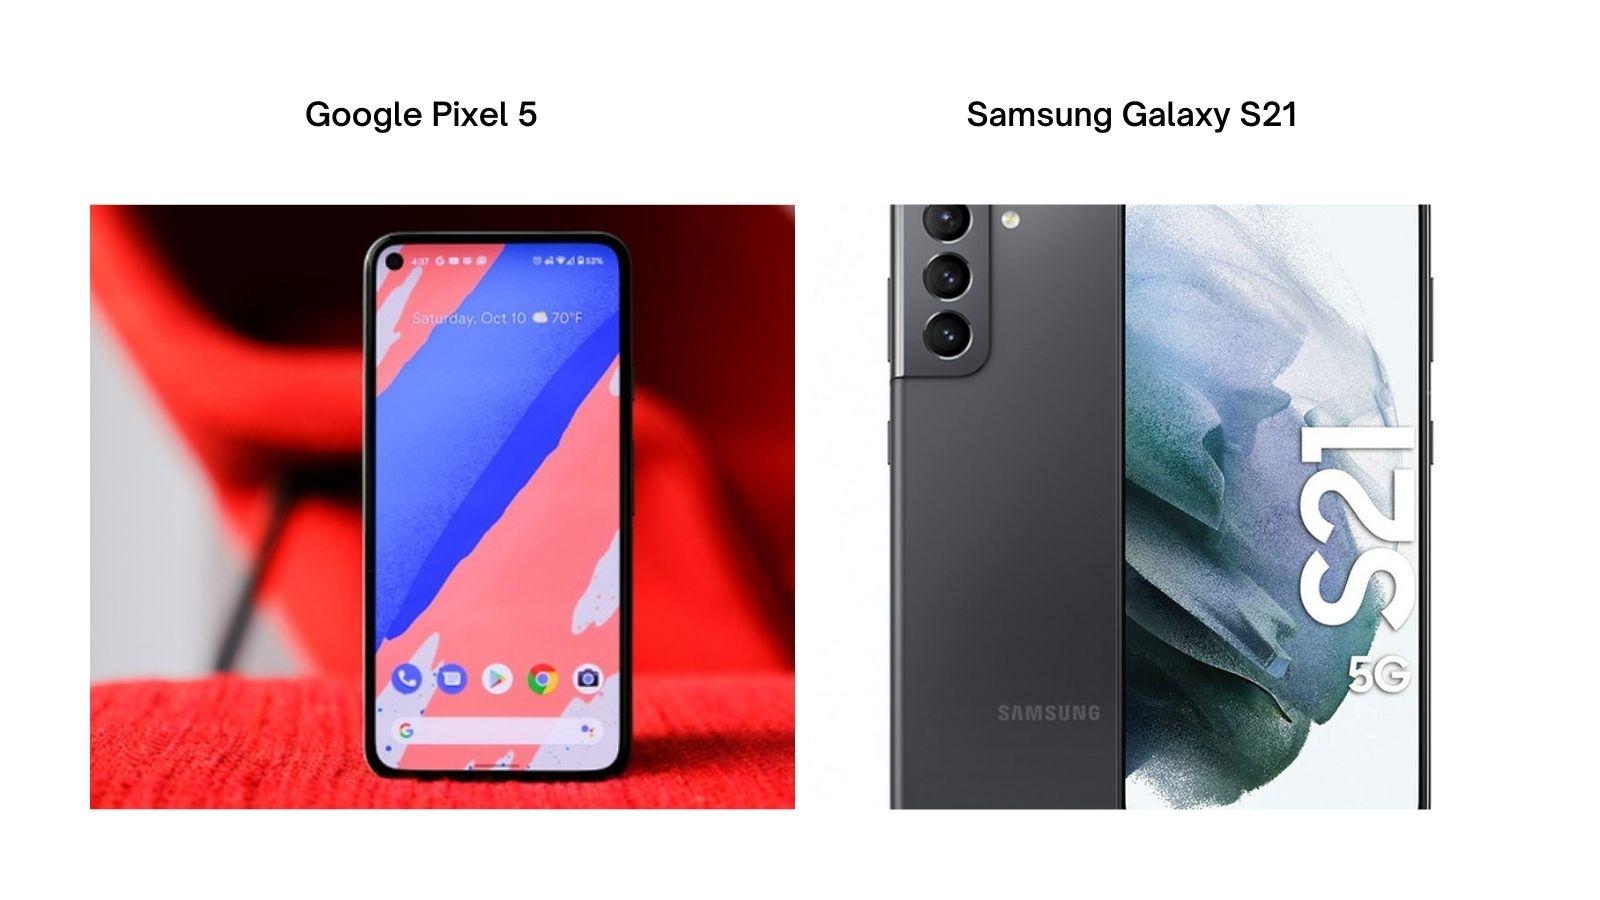 DESIGN : Samsung Galaxy S21 vs Google Pixel 5